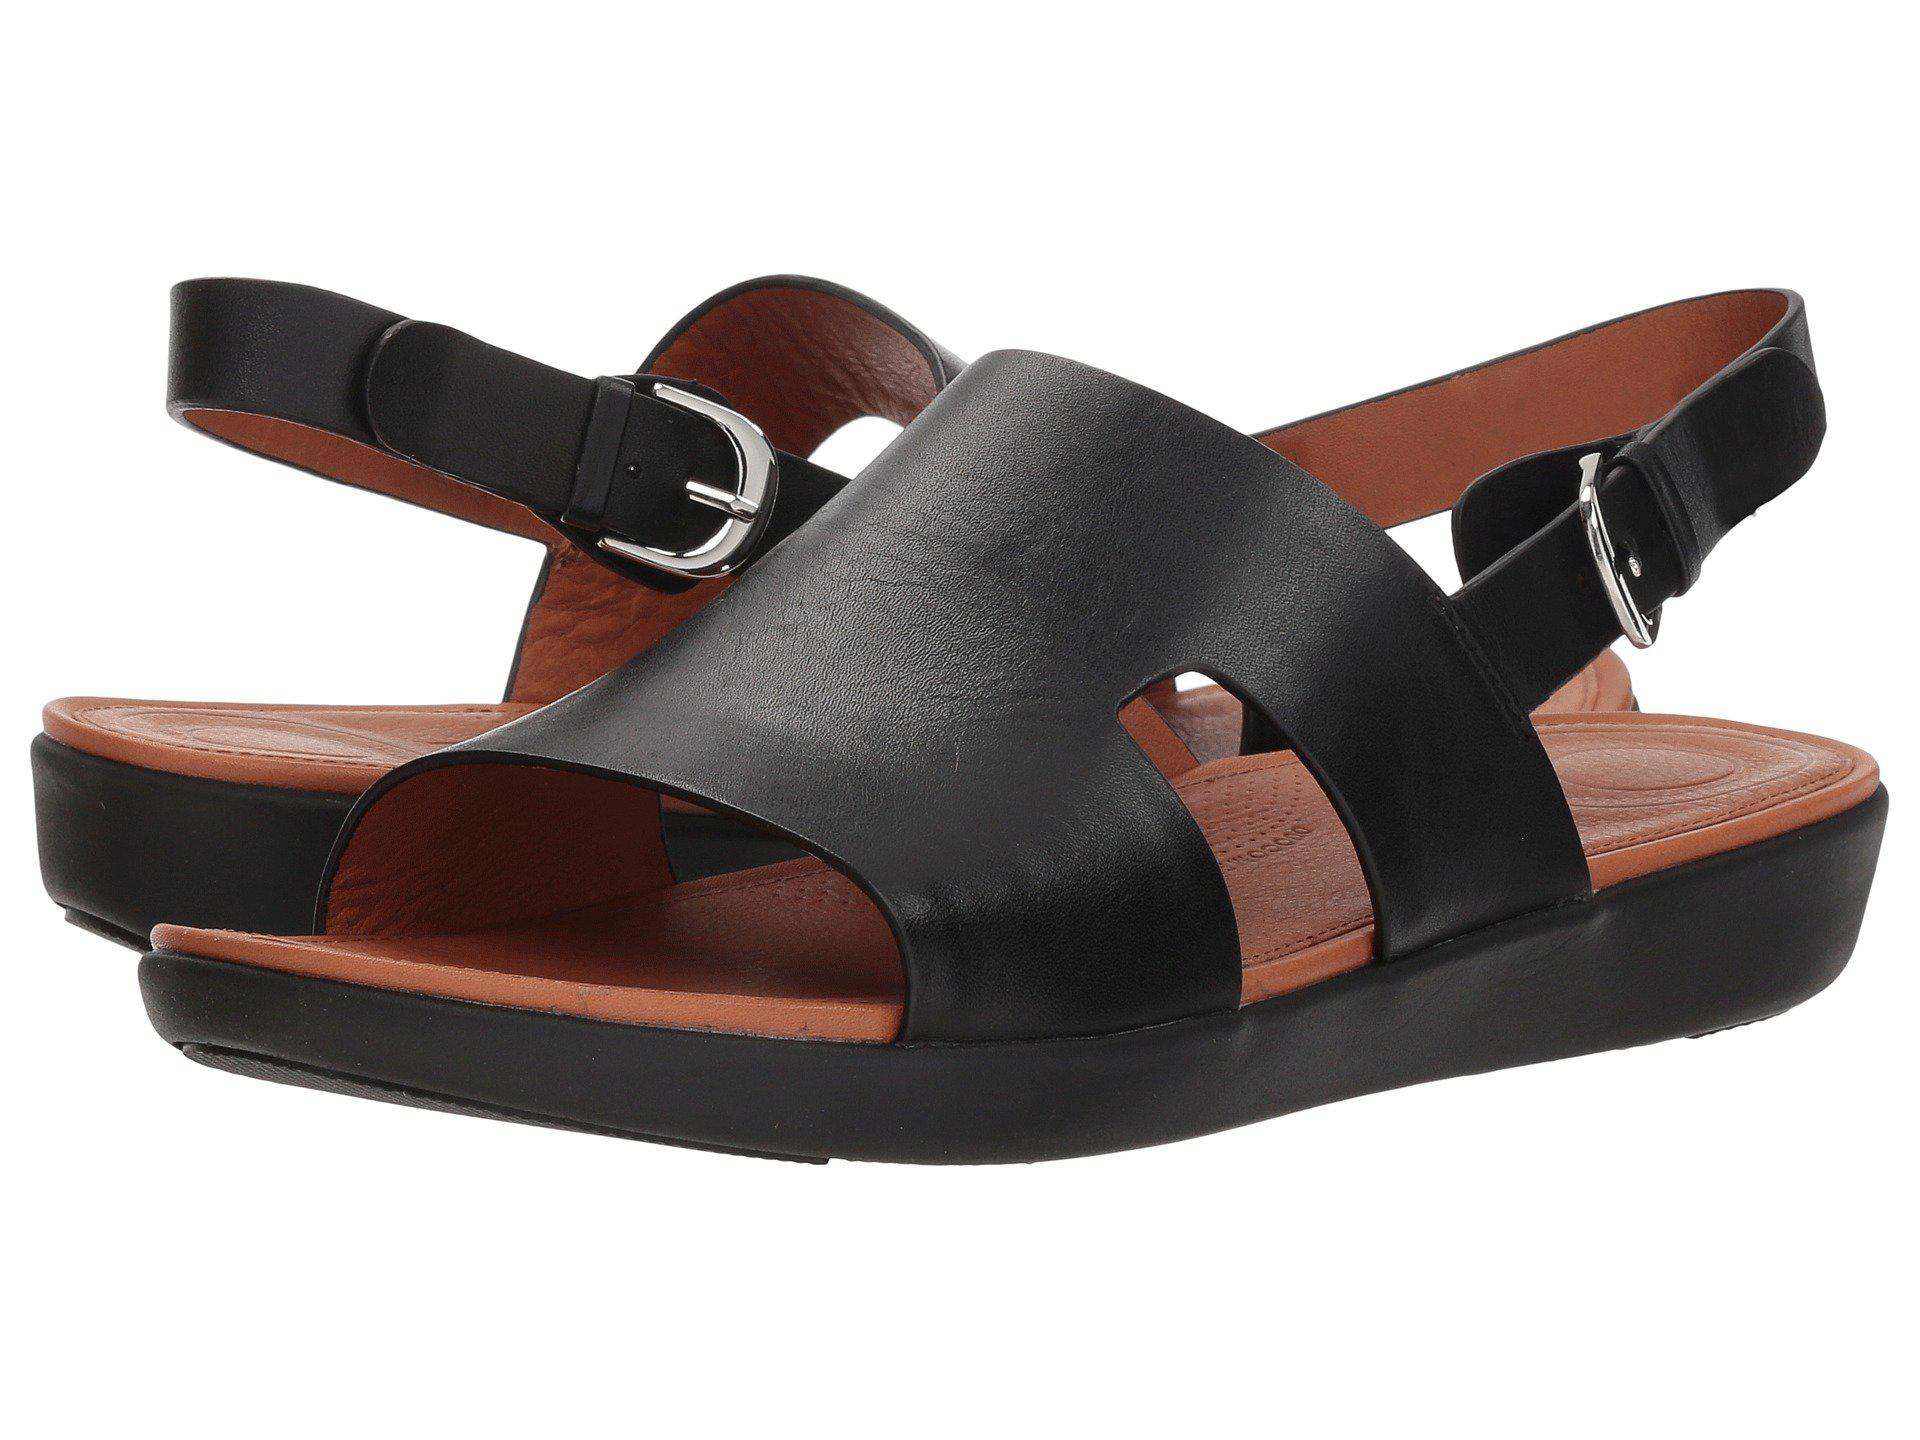 89bcd41d2799 Lyst - Fitflop H-bar Back Strap Sandals in Black